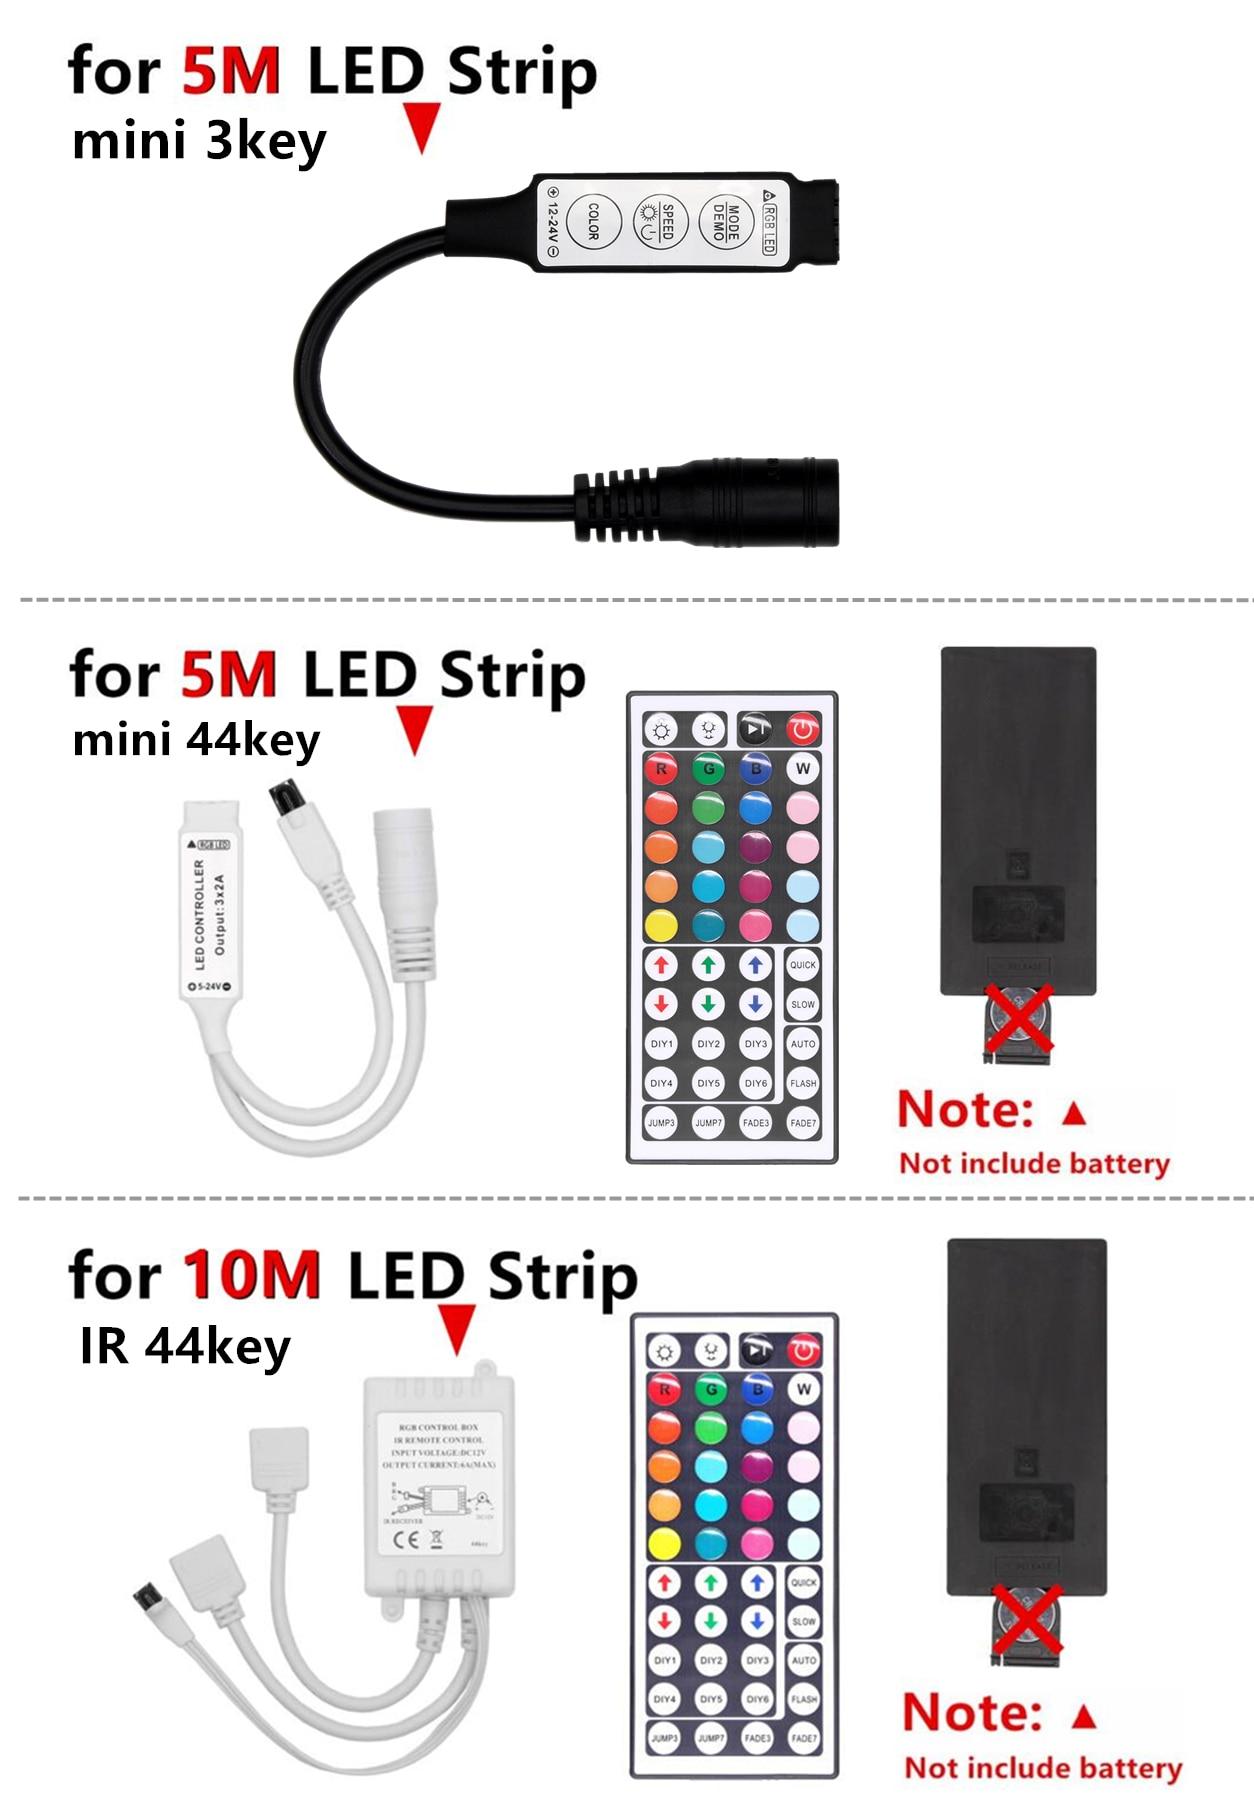 RGB LED Strip Light RGB 5050 SMD 2835 Flexible Ribbon fita led light strip RGB 5M RGB LED Strip Light RGB 5050 SMD 2835 Flexible Ribbon fita led light strip RGB 5M 10M Tape Diode DC 12V Remote Control Adapter